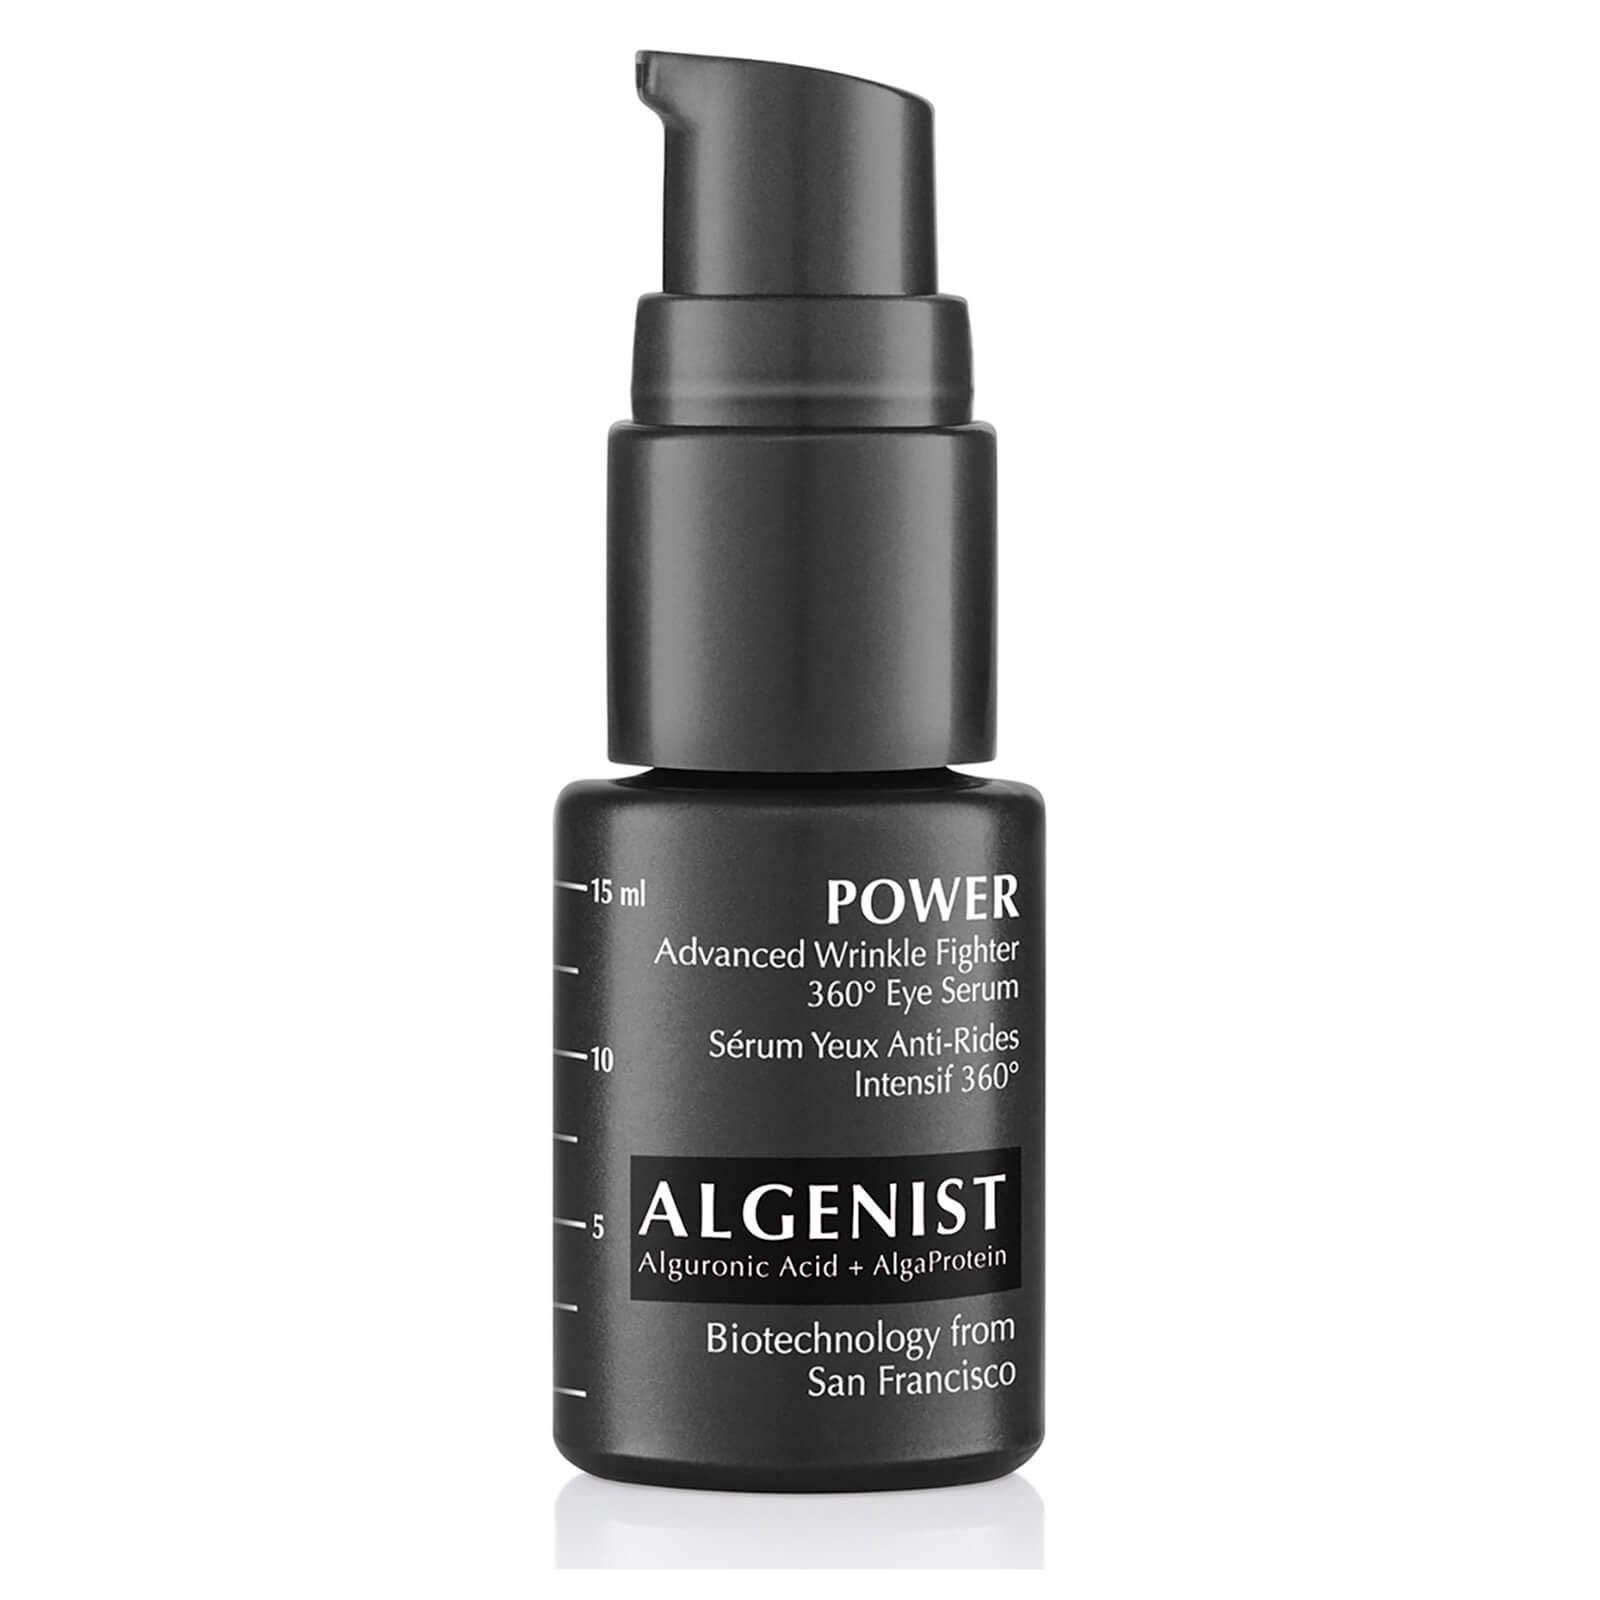 algenist power advanced wrinkle fighter 360° eye serum 15ml